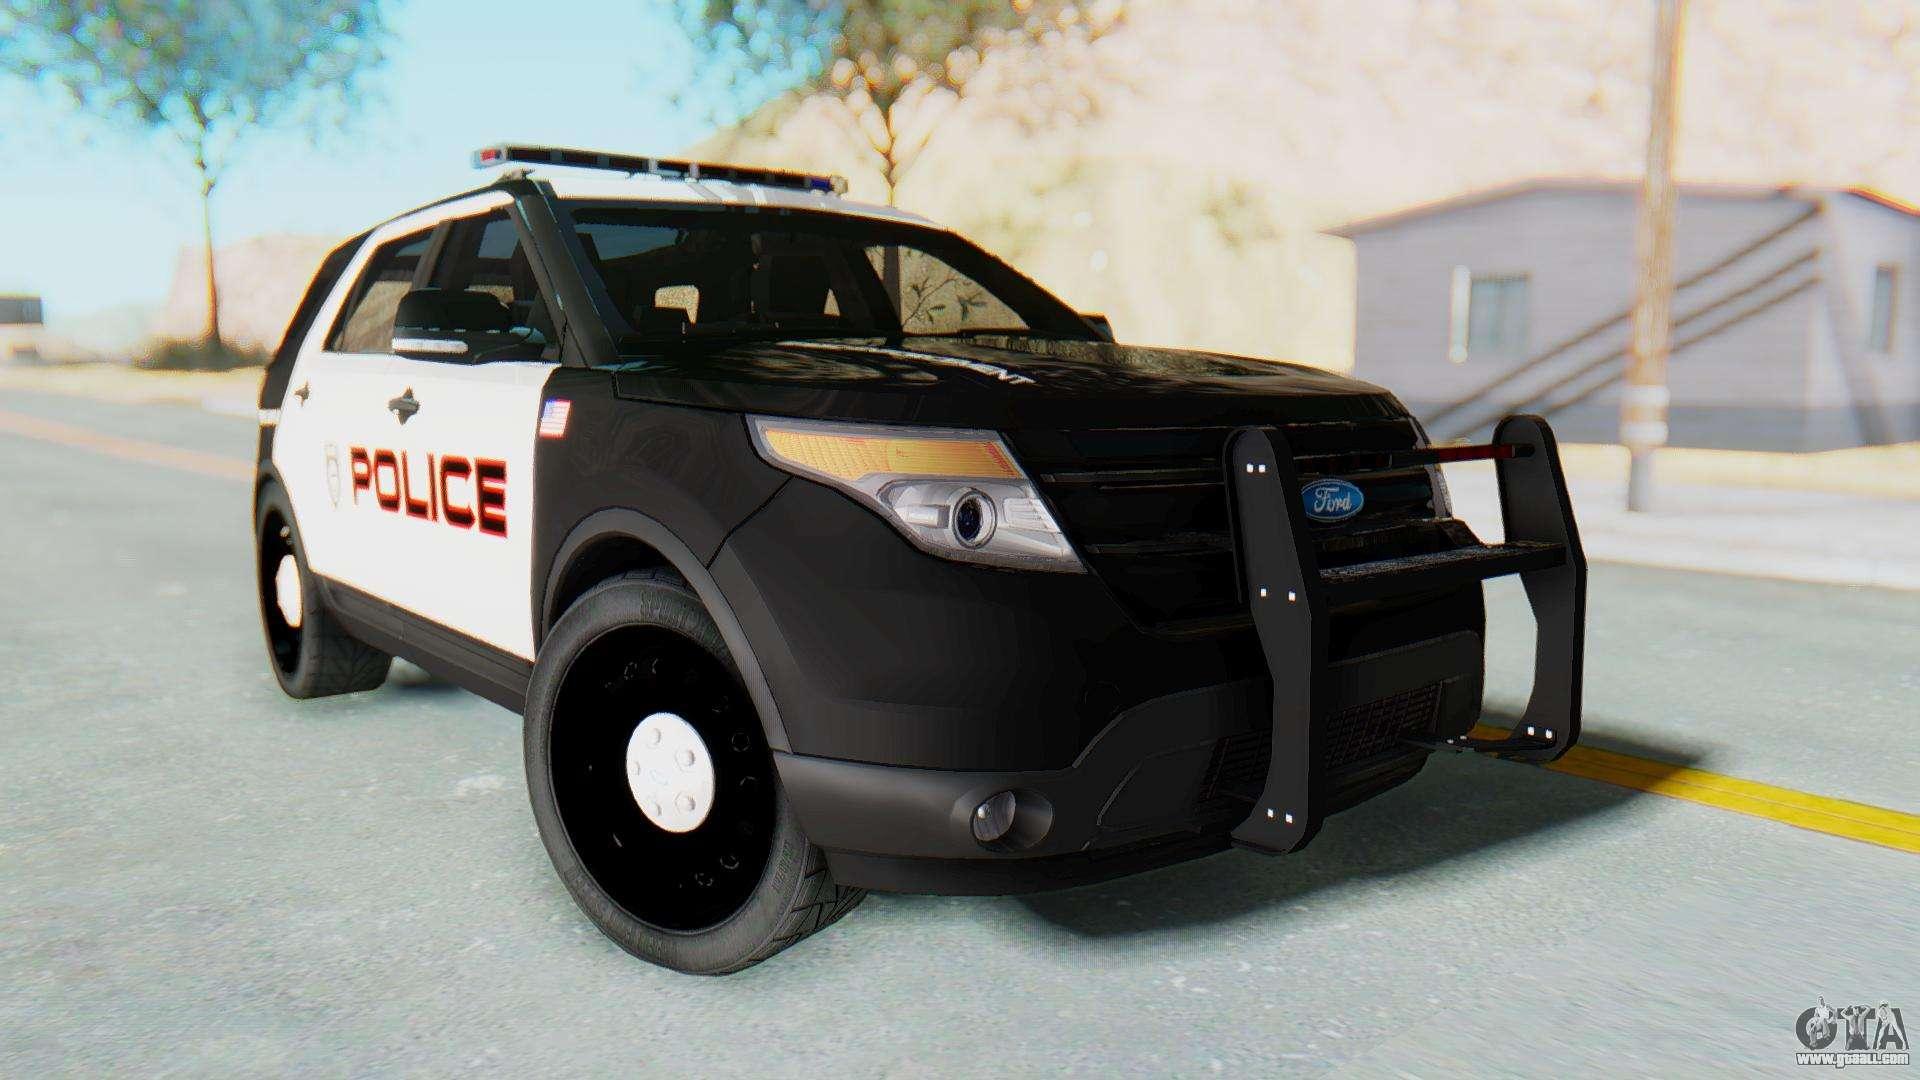 Ford Explorer Police for GTA San Andreas Gta San Andreas Police Cars